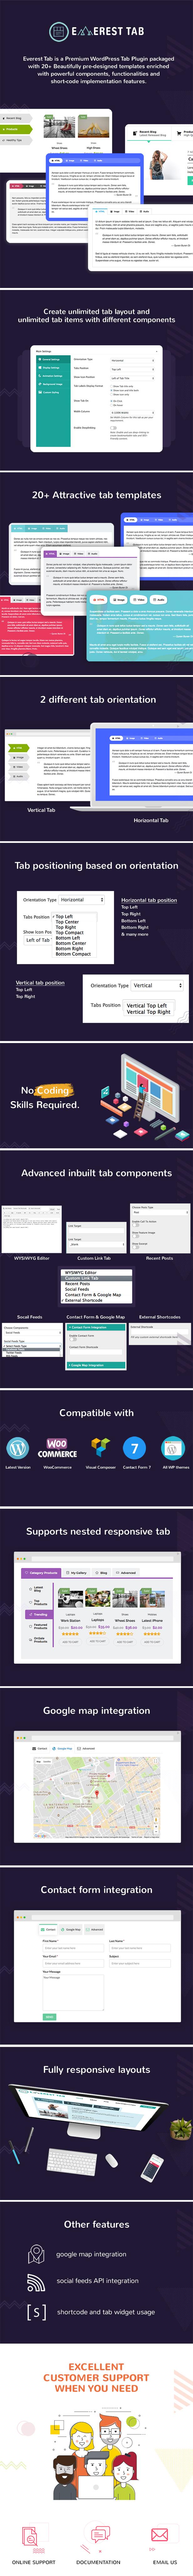 everest-tab-sales-page-codecanyon.jpg